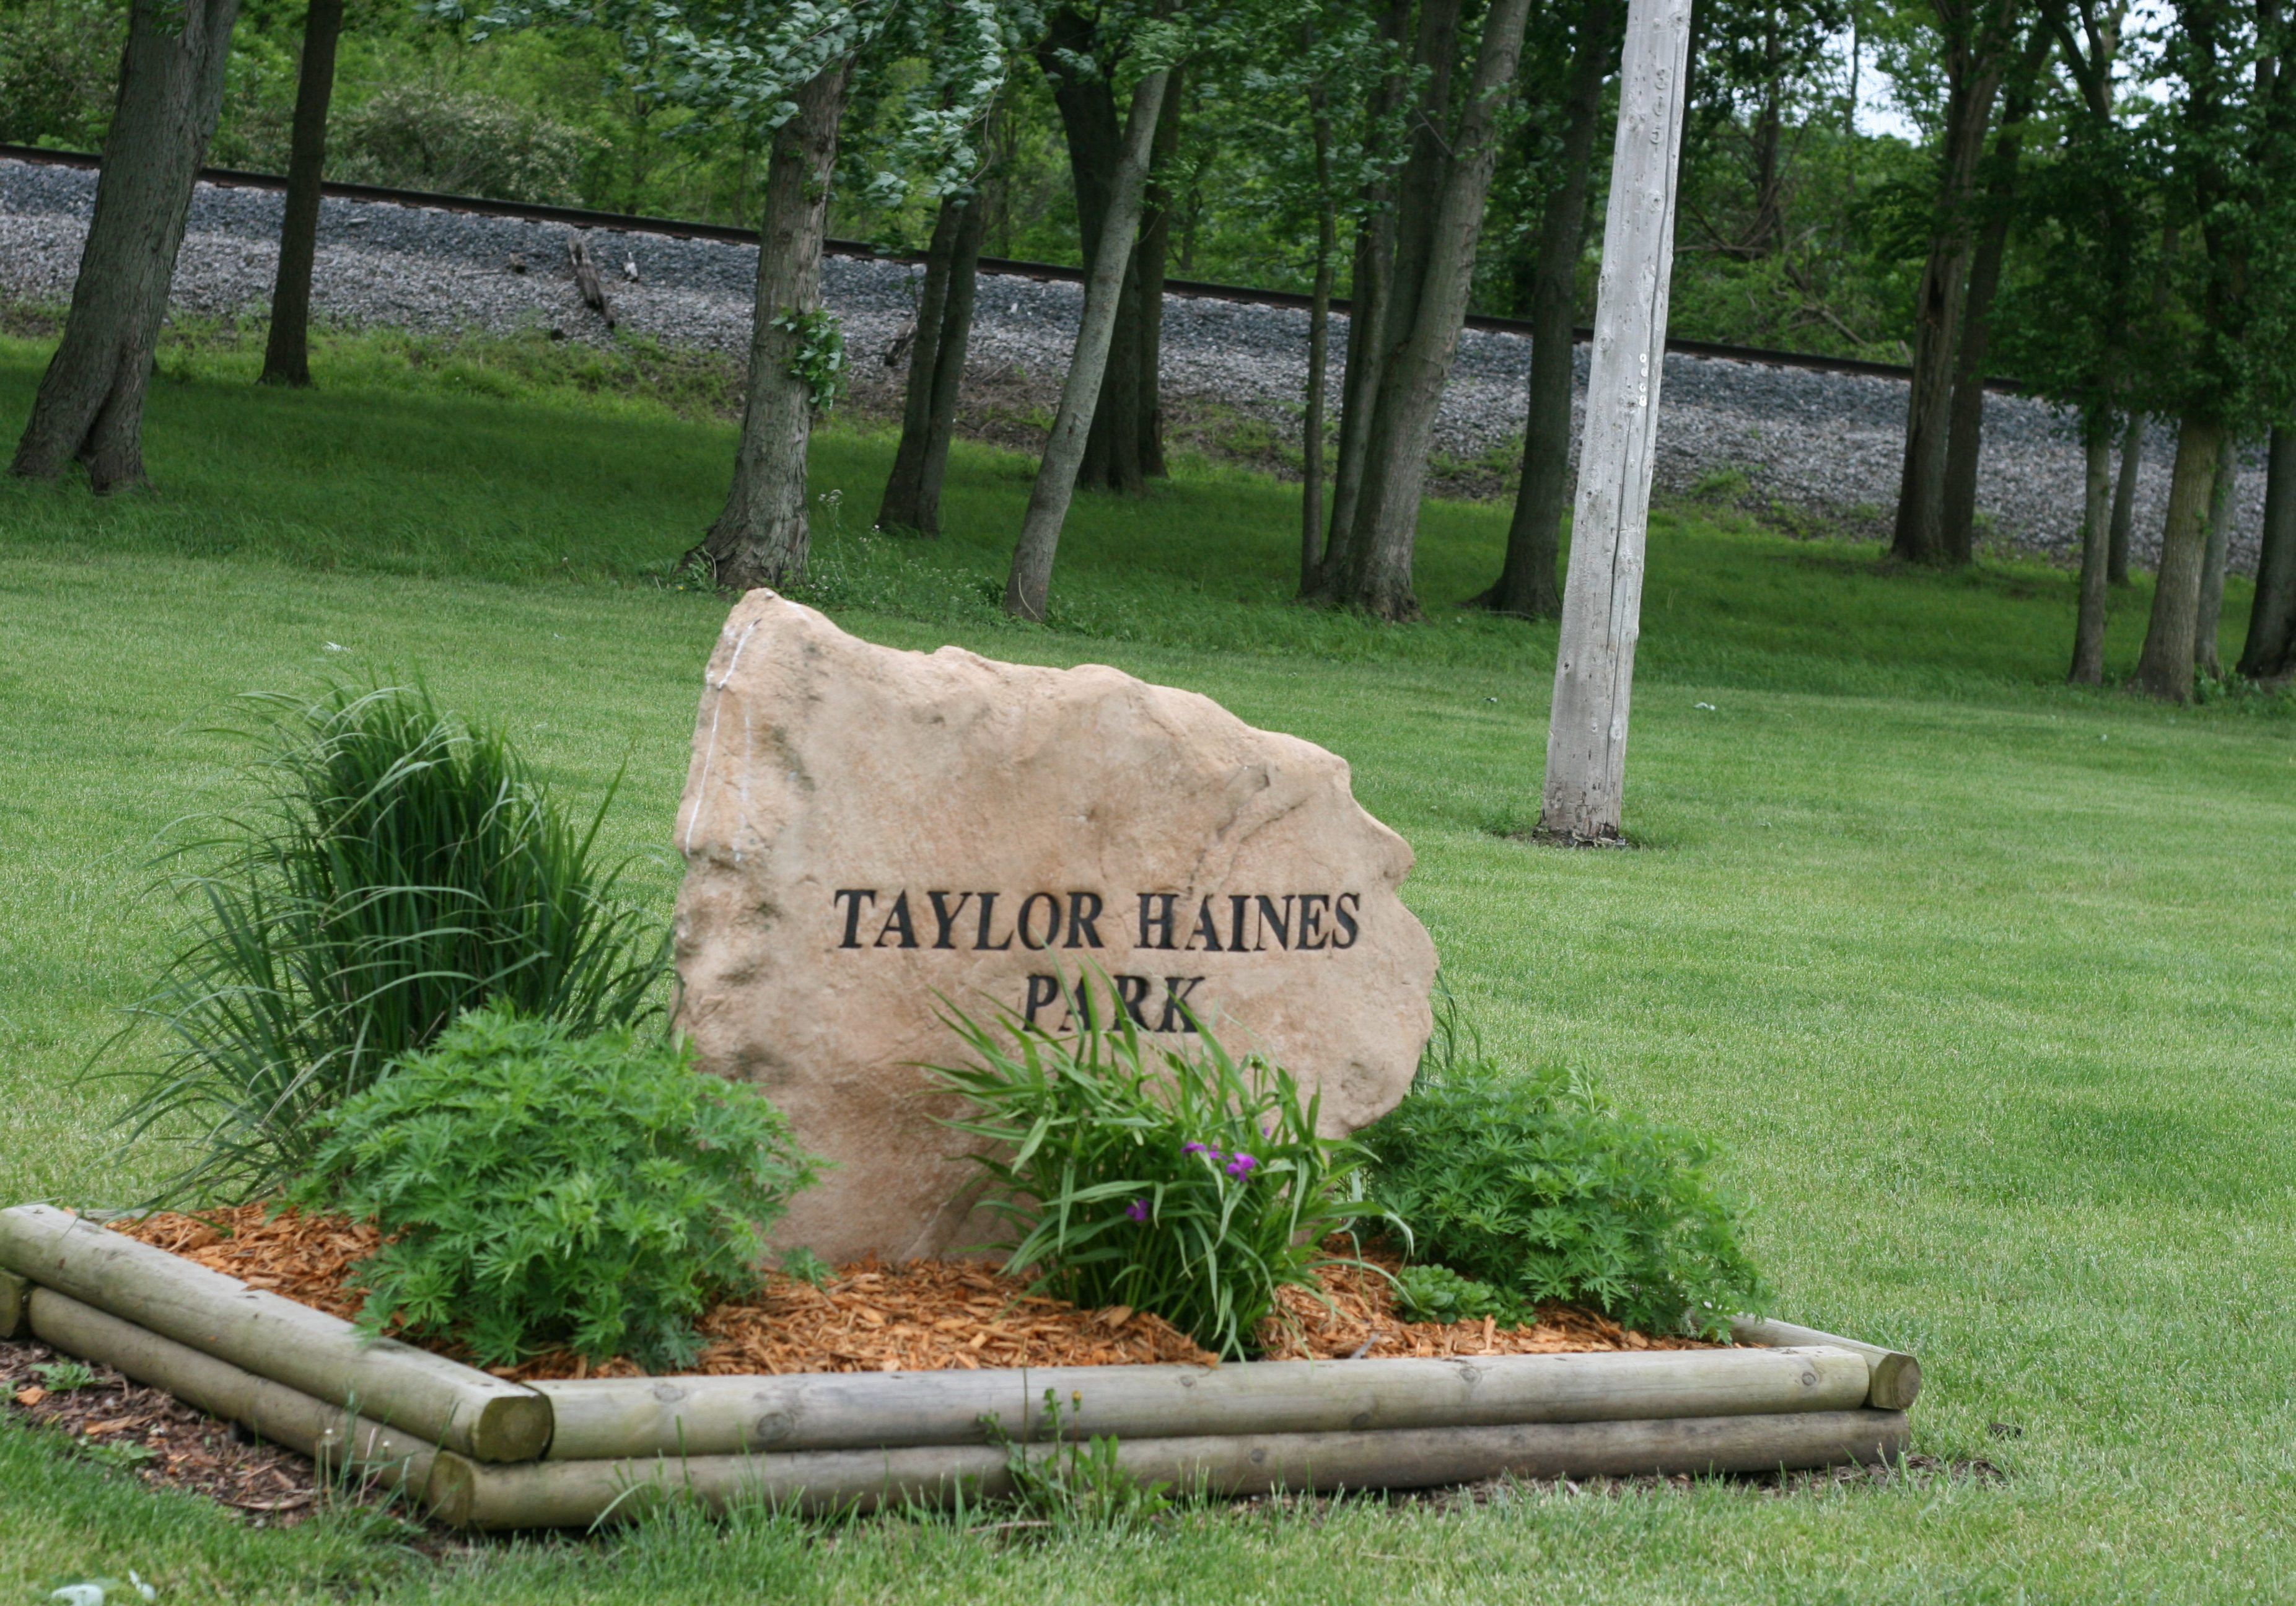 Taylor Haines Park